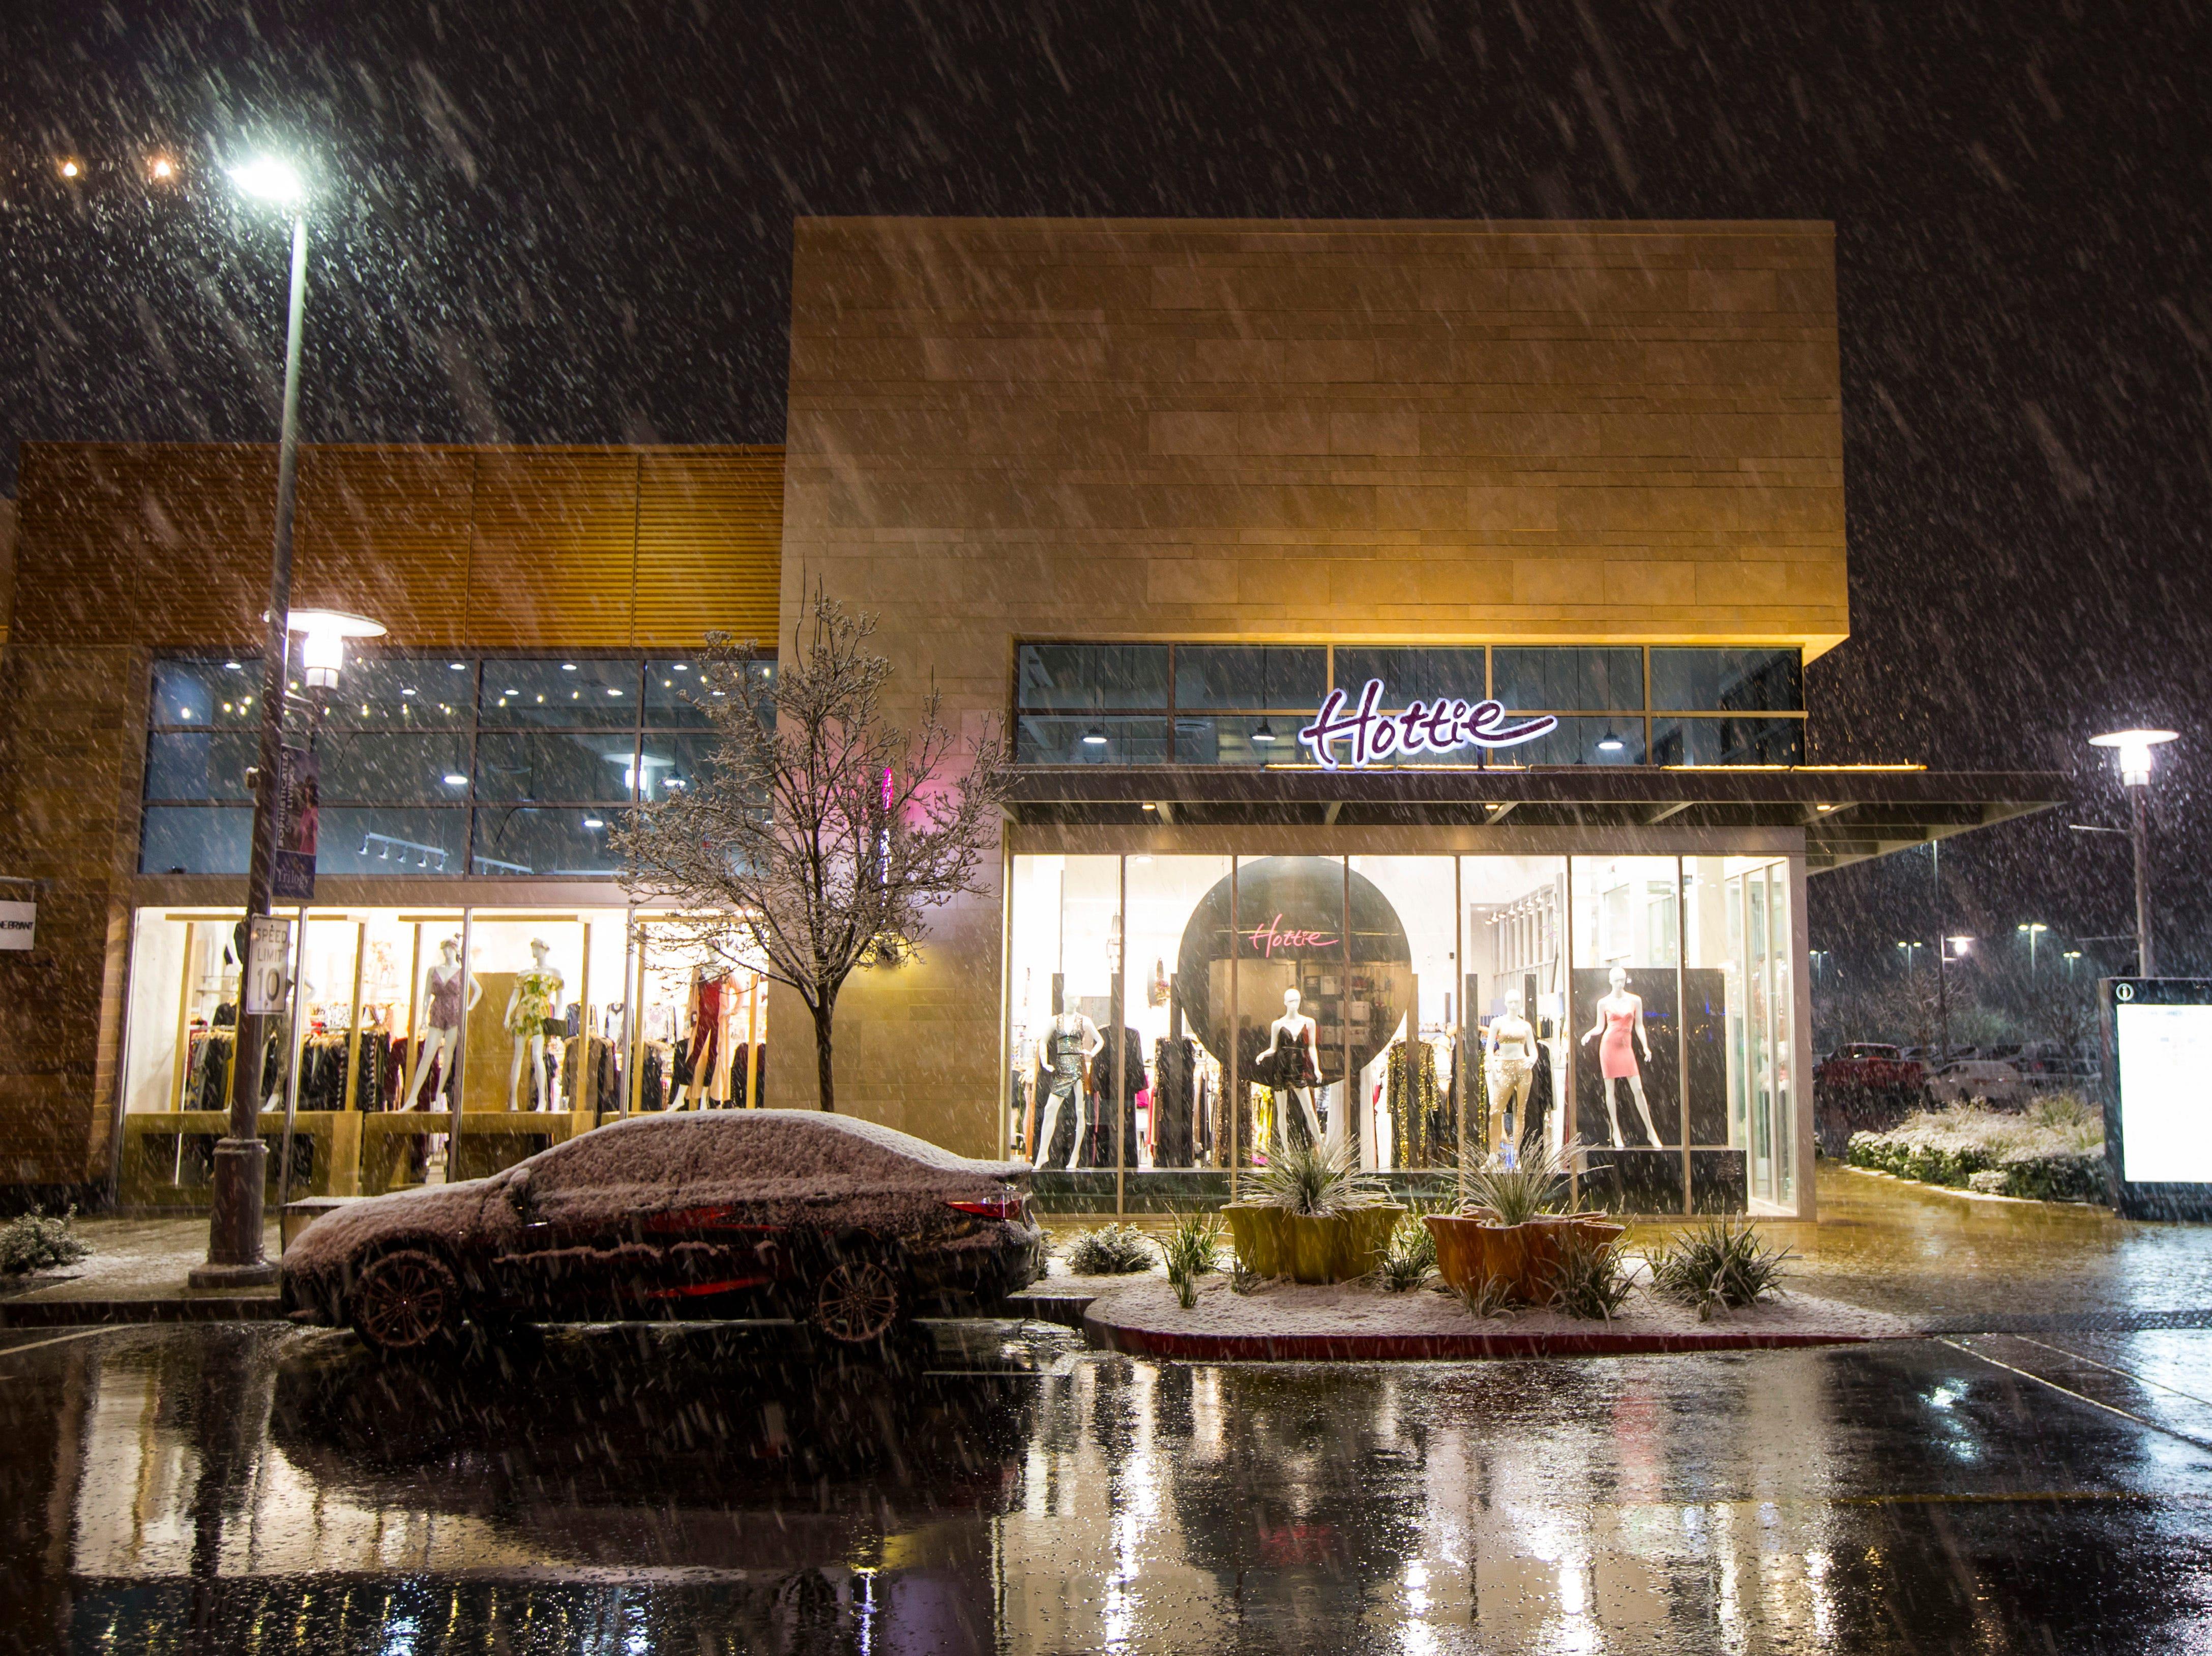 Snow falls around Downtown Summerlin in Las Vegas on Wednesday, Feb. 20, 2019. (Chase Stevens/Las Vegas Review-Journal via AP)